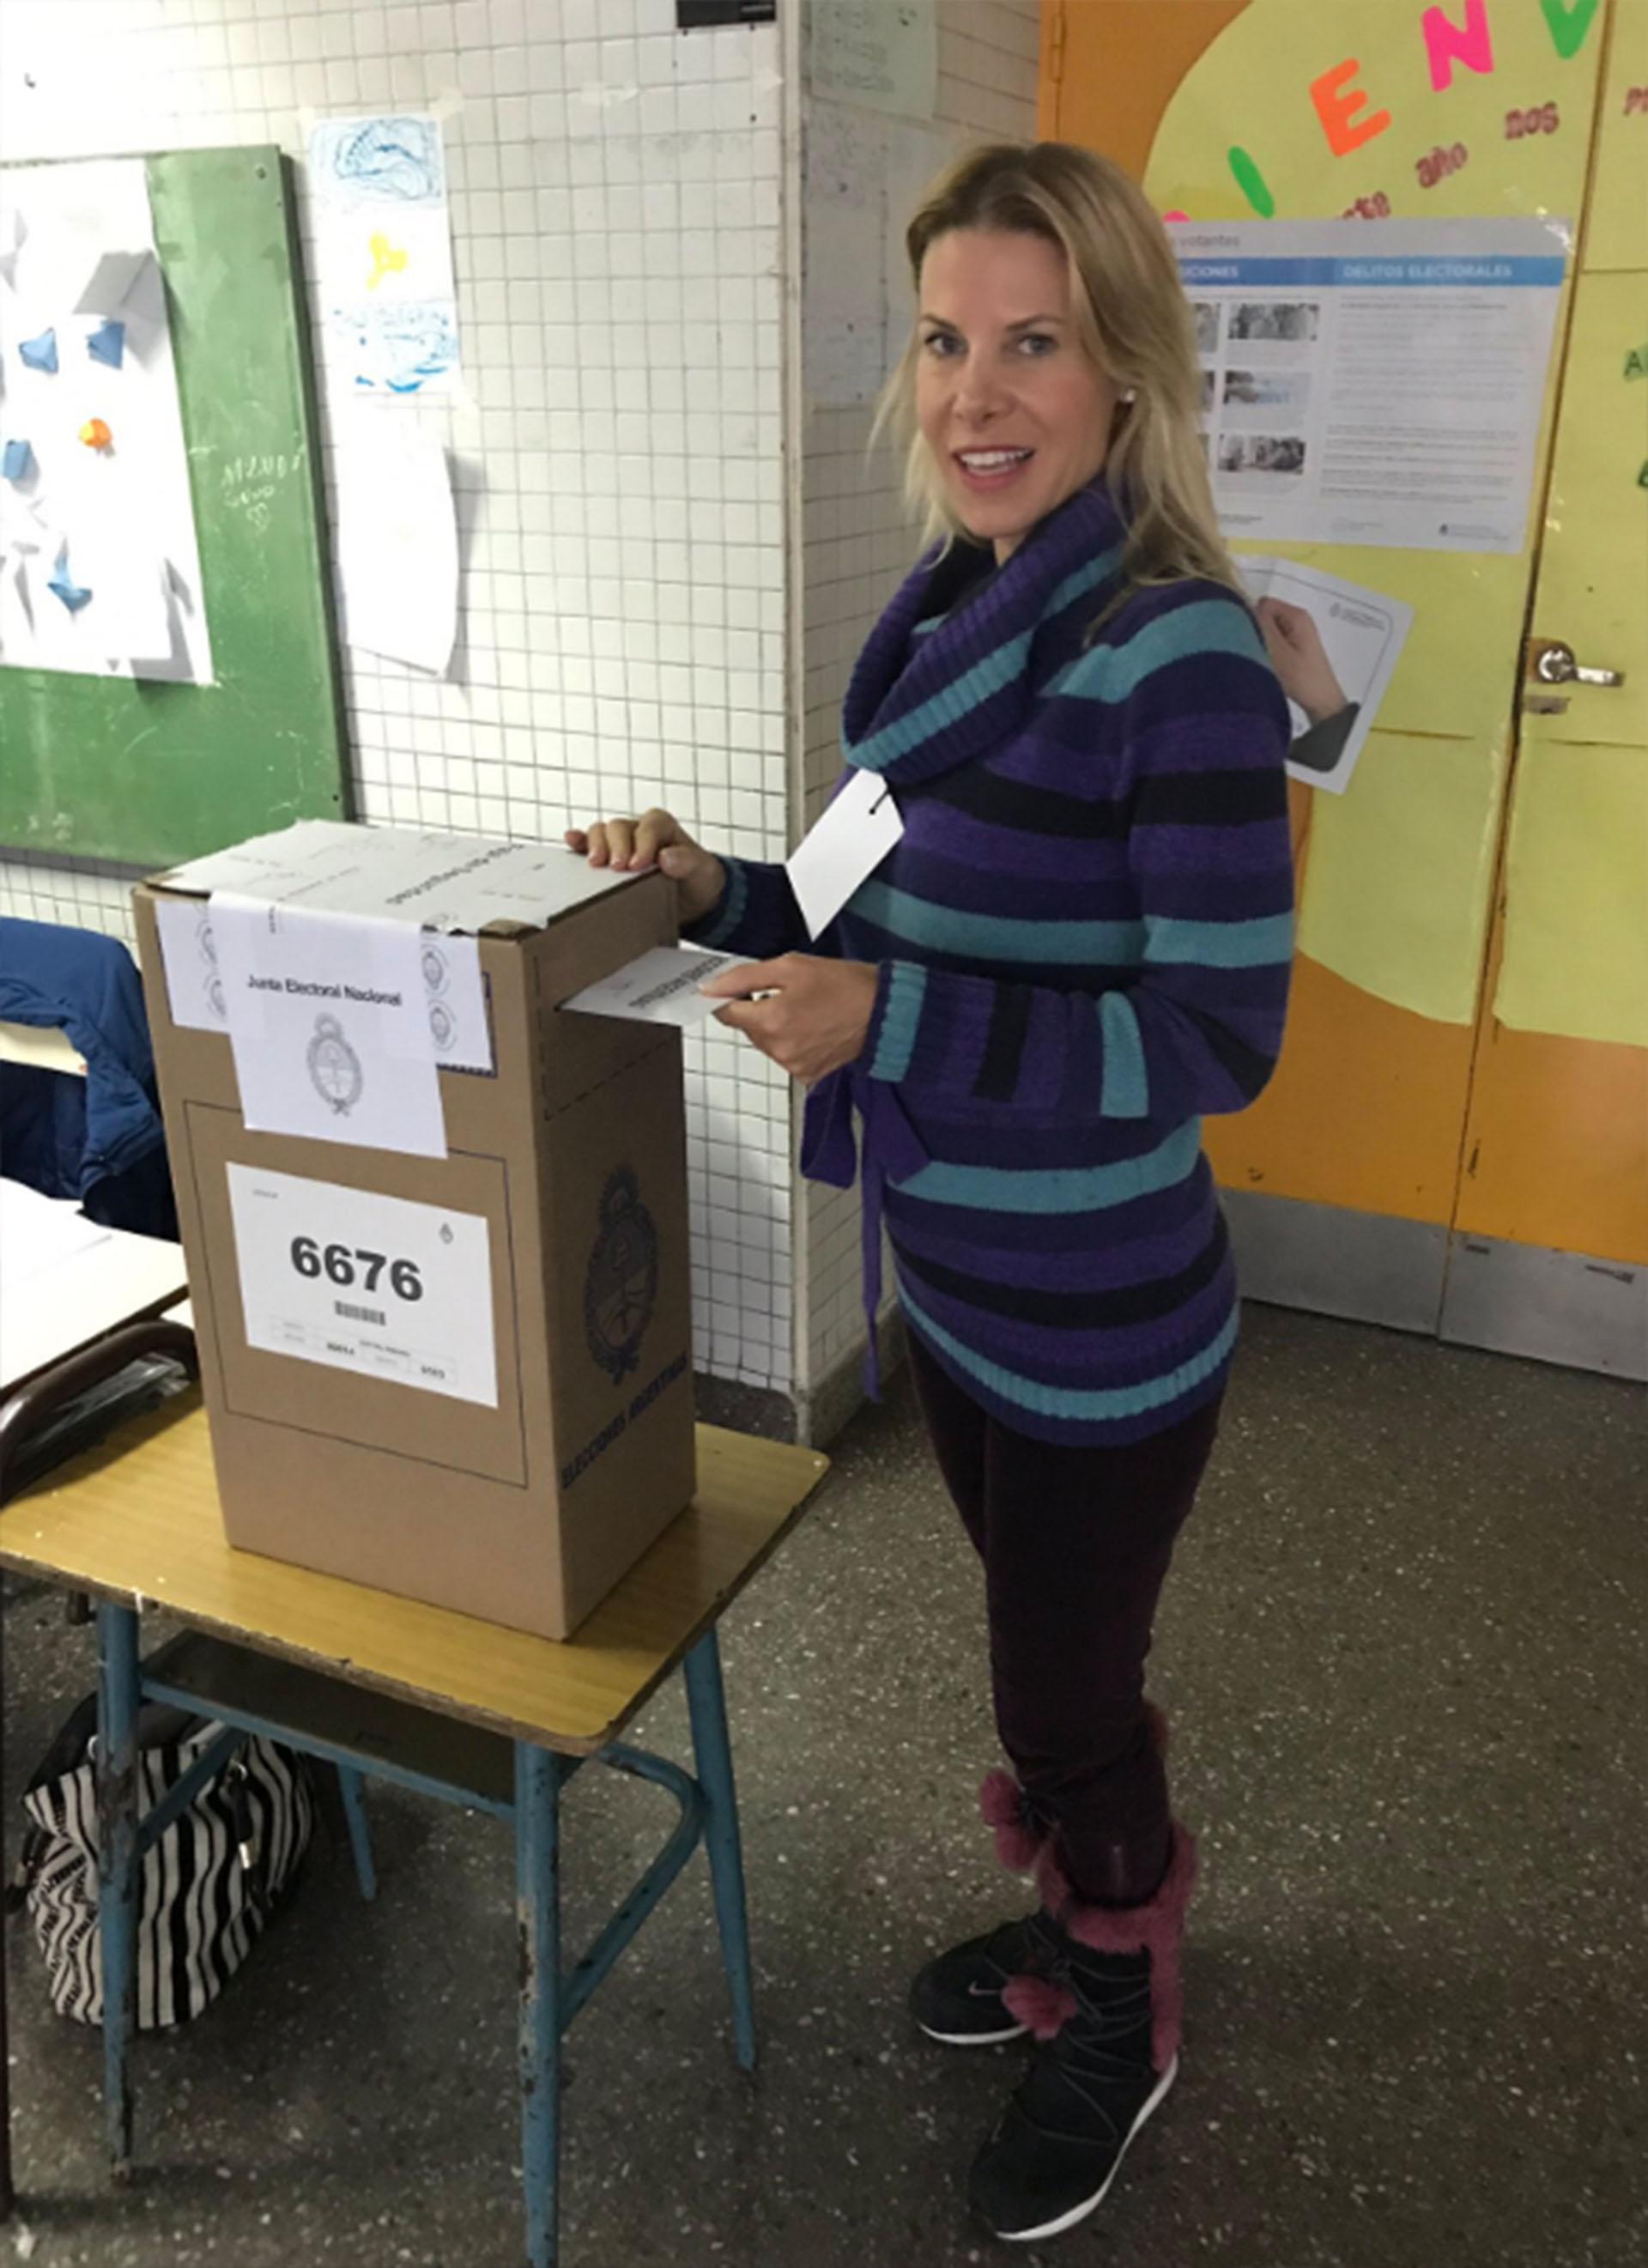 Karen Reichardt ya emitió su voto